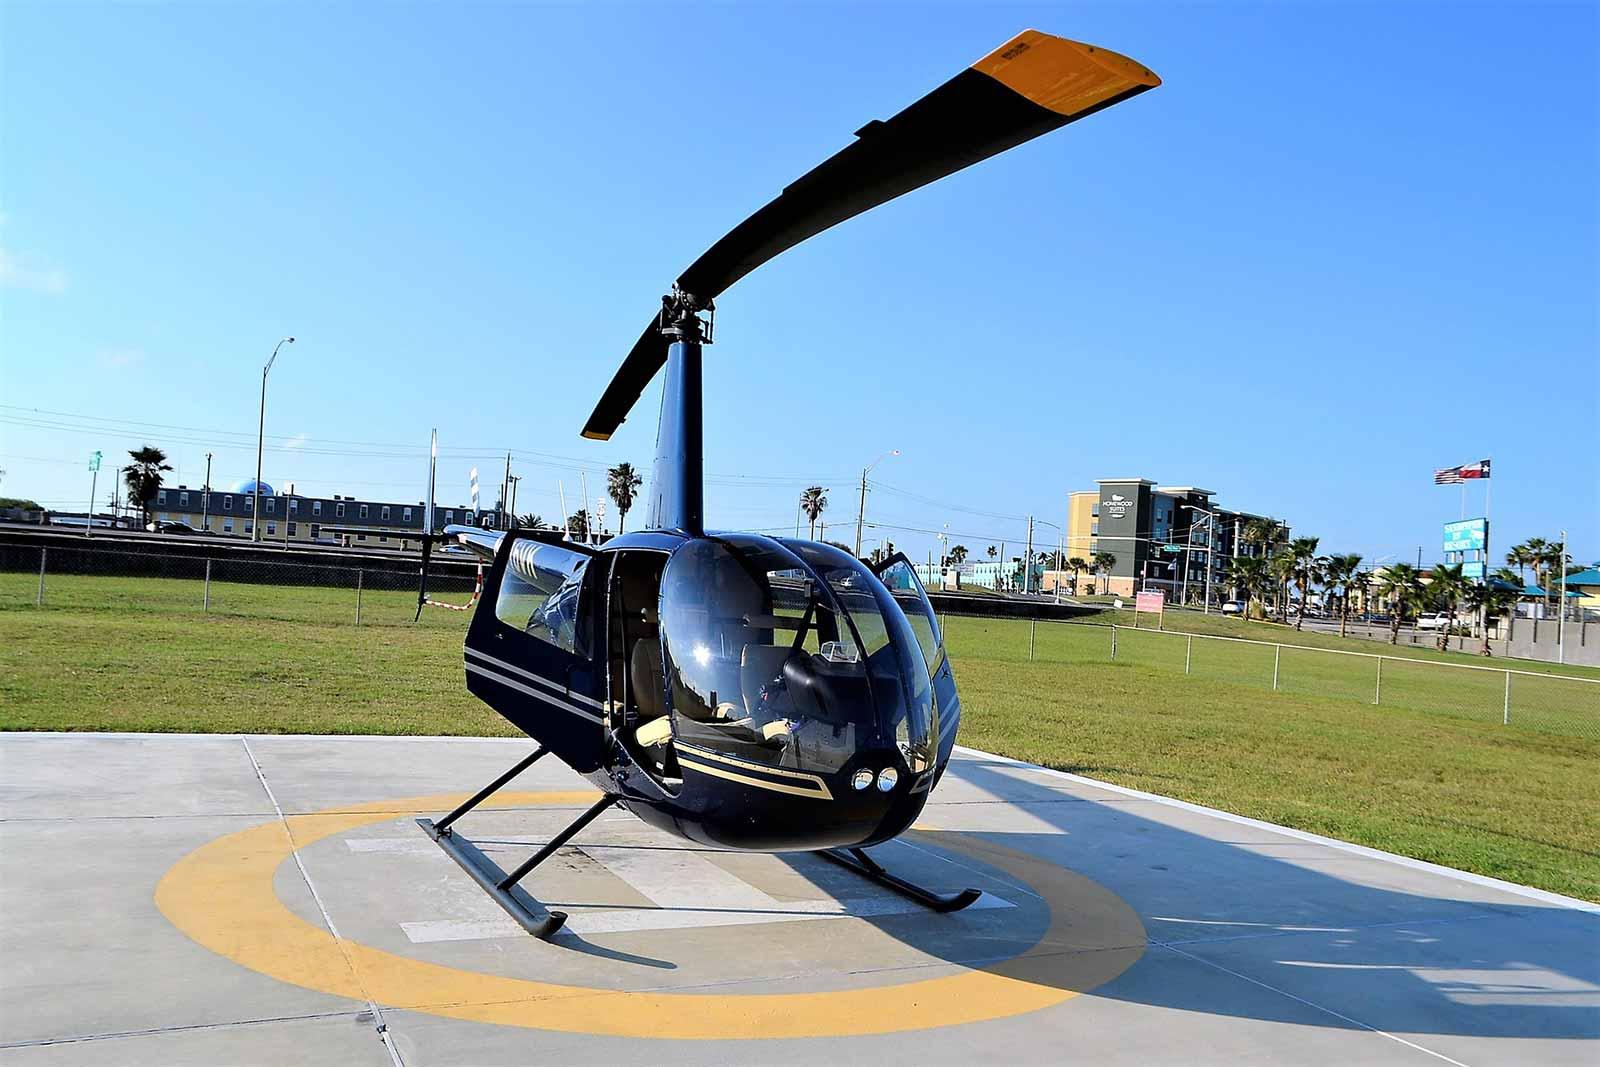 Helikopter-selber-fliegen-Mallorca-Flugstunde-Helikopter-2